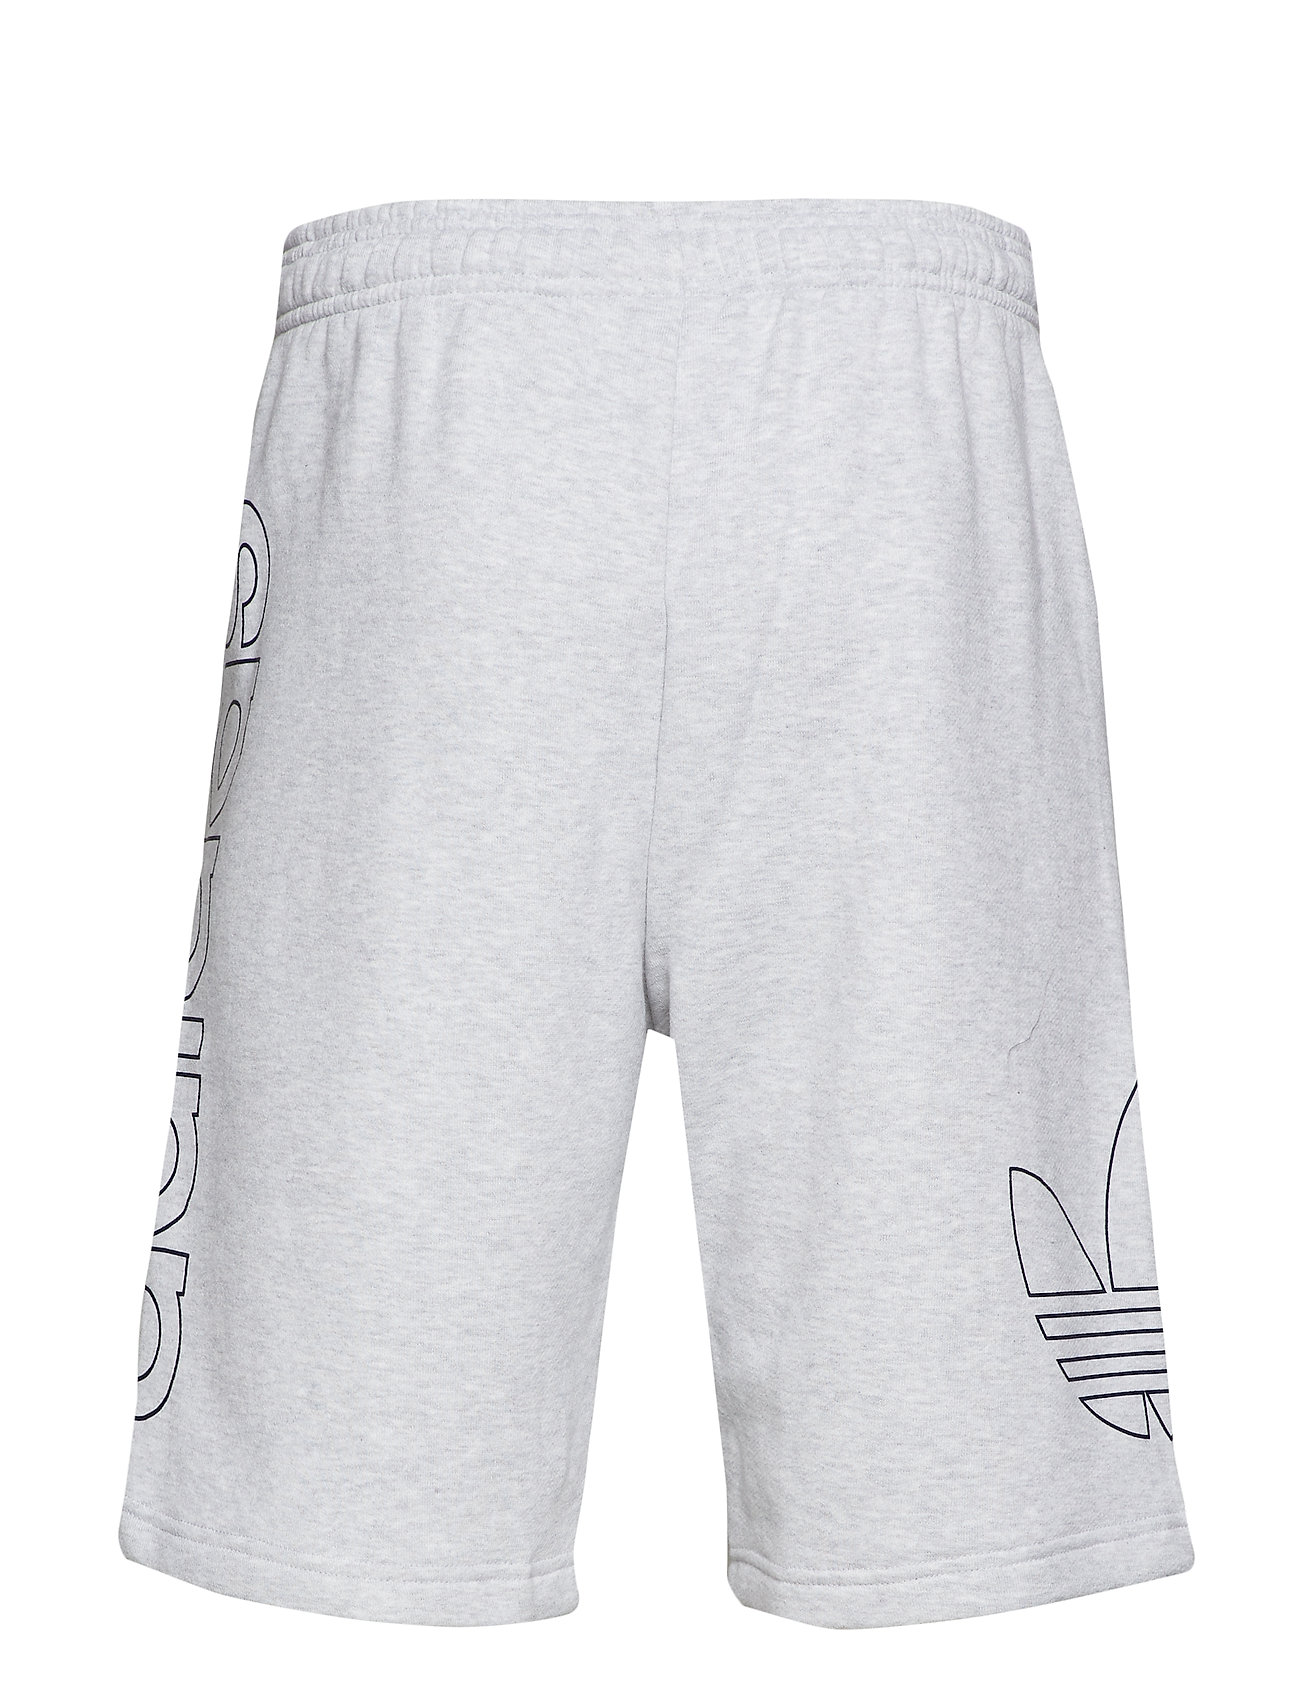 Adidas Checked Sort Grå Shorts Herre Online